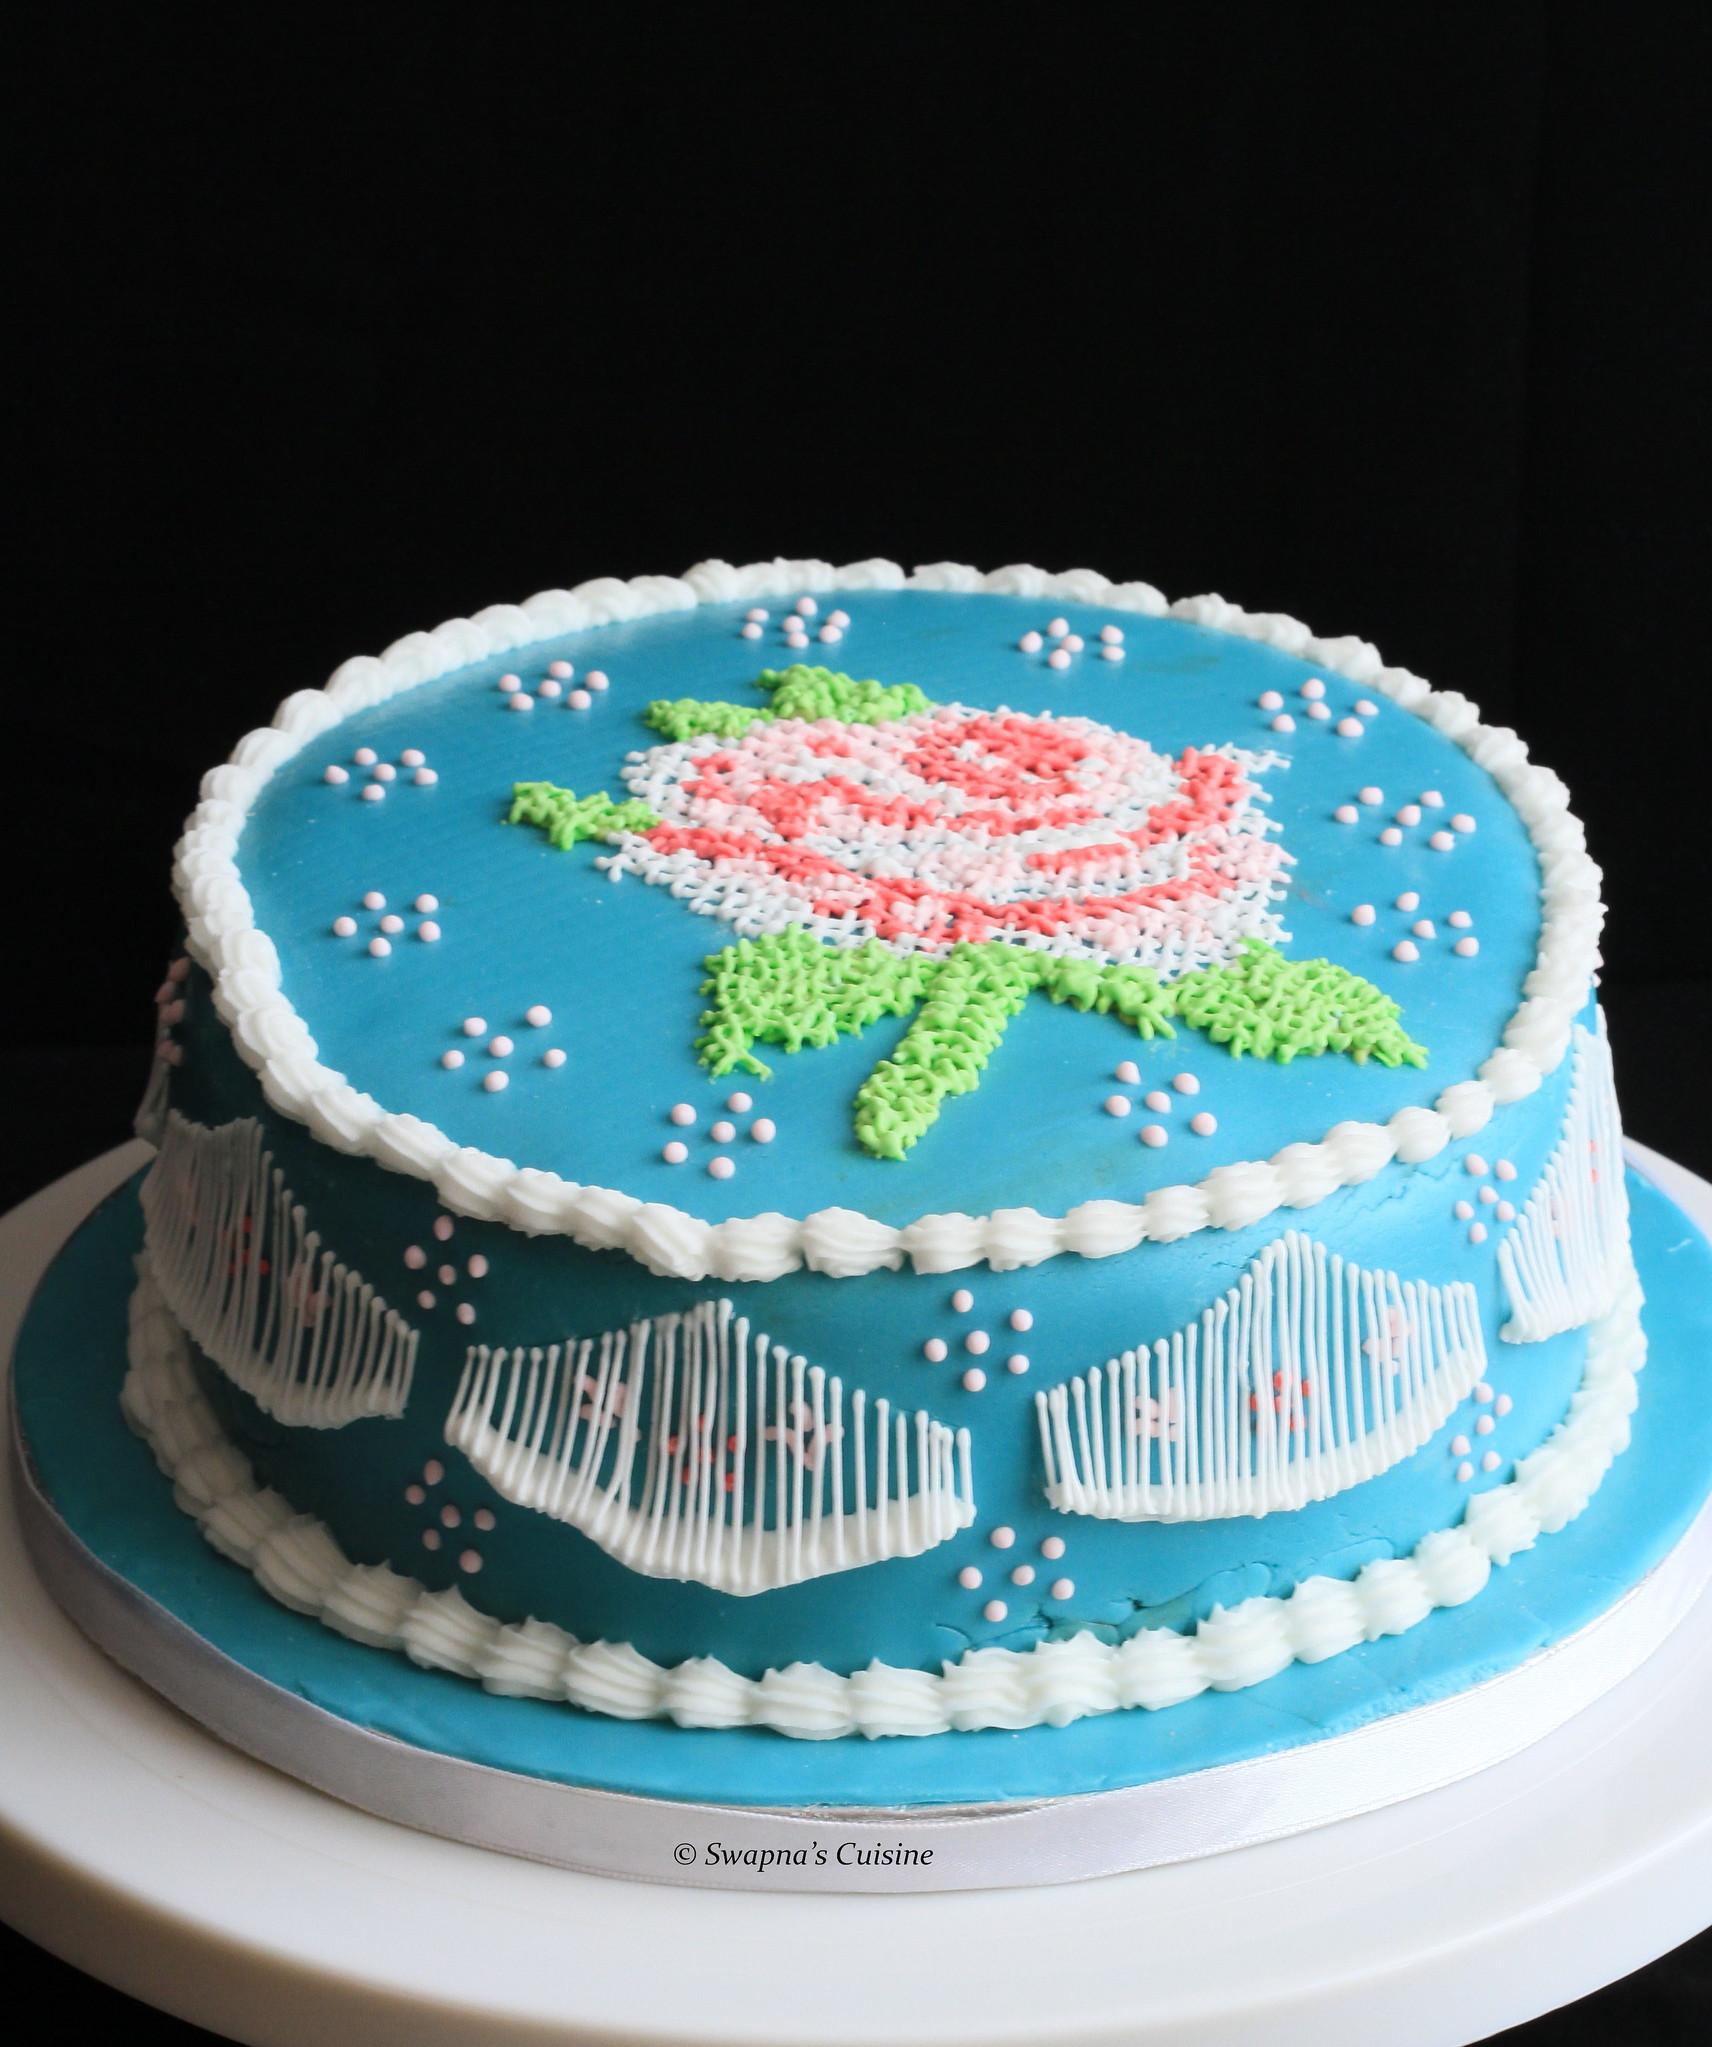 Swapna s Cuisine: Royal Icing Cross Stitch Cake